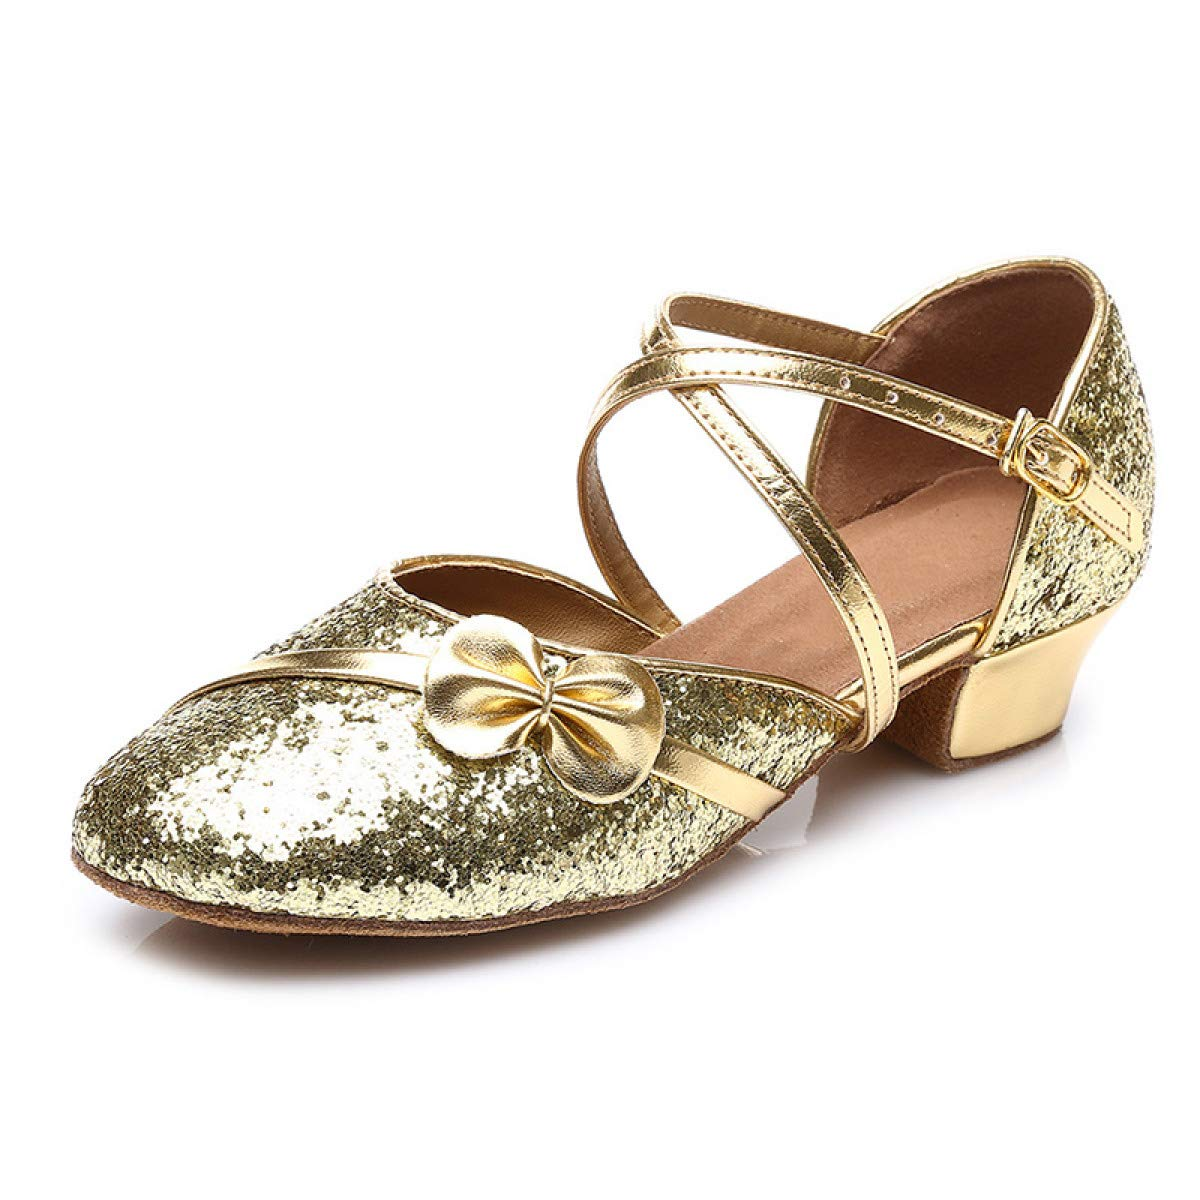 MELLOW SHOP Women Latin Dance Shoes 17-25CM Ladies Ballroom Tango Low Heel Dance